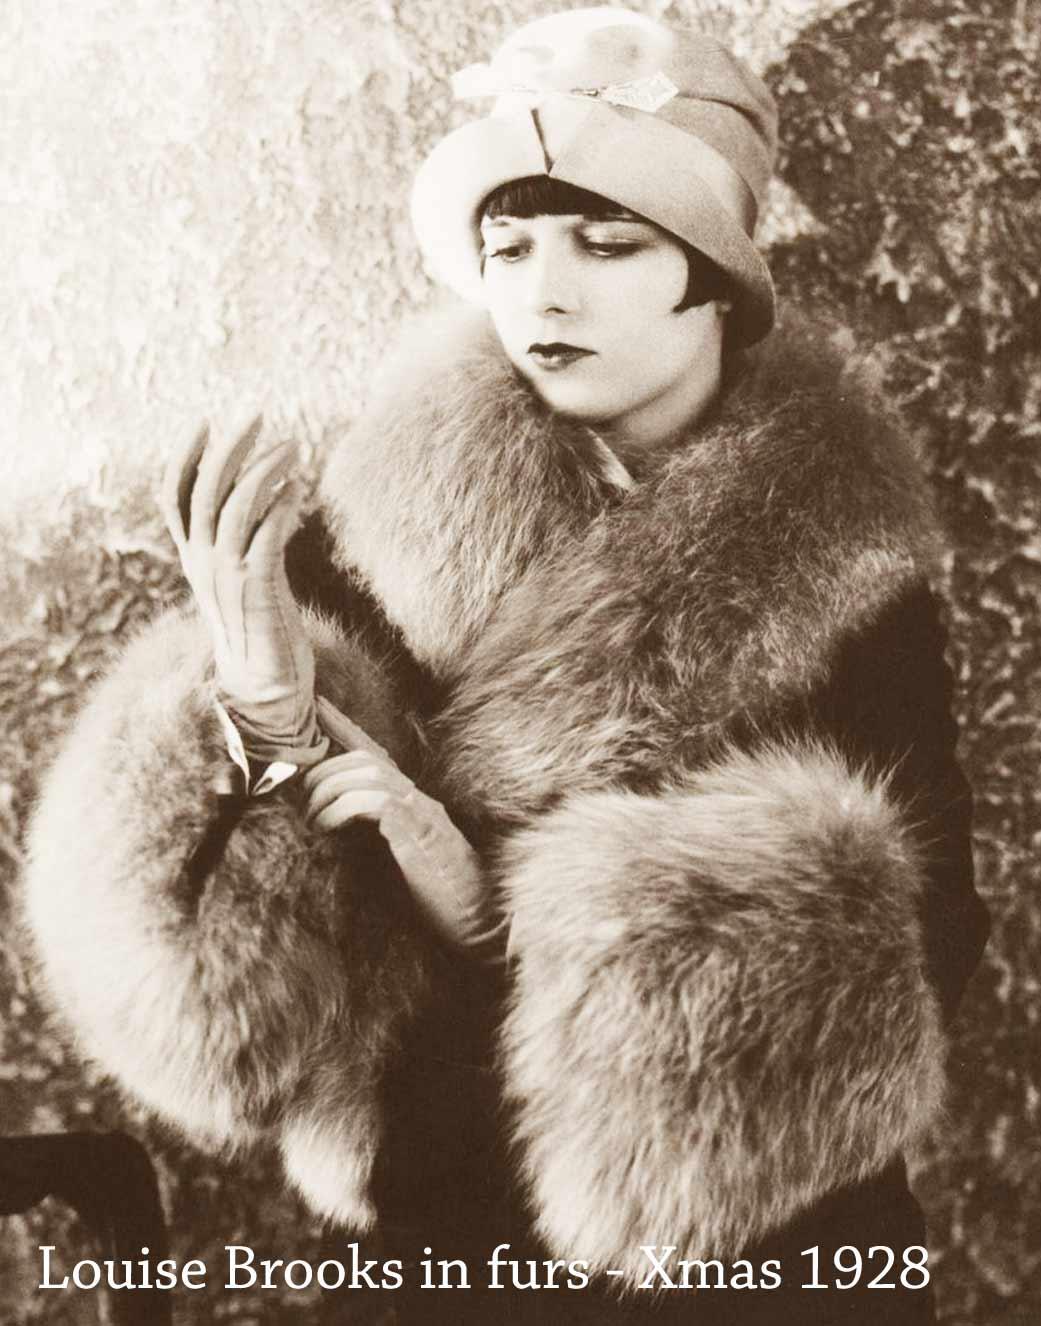 Post War Glamour Girls - Swan Songs